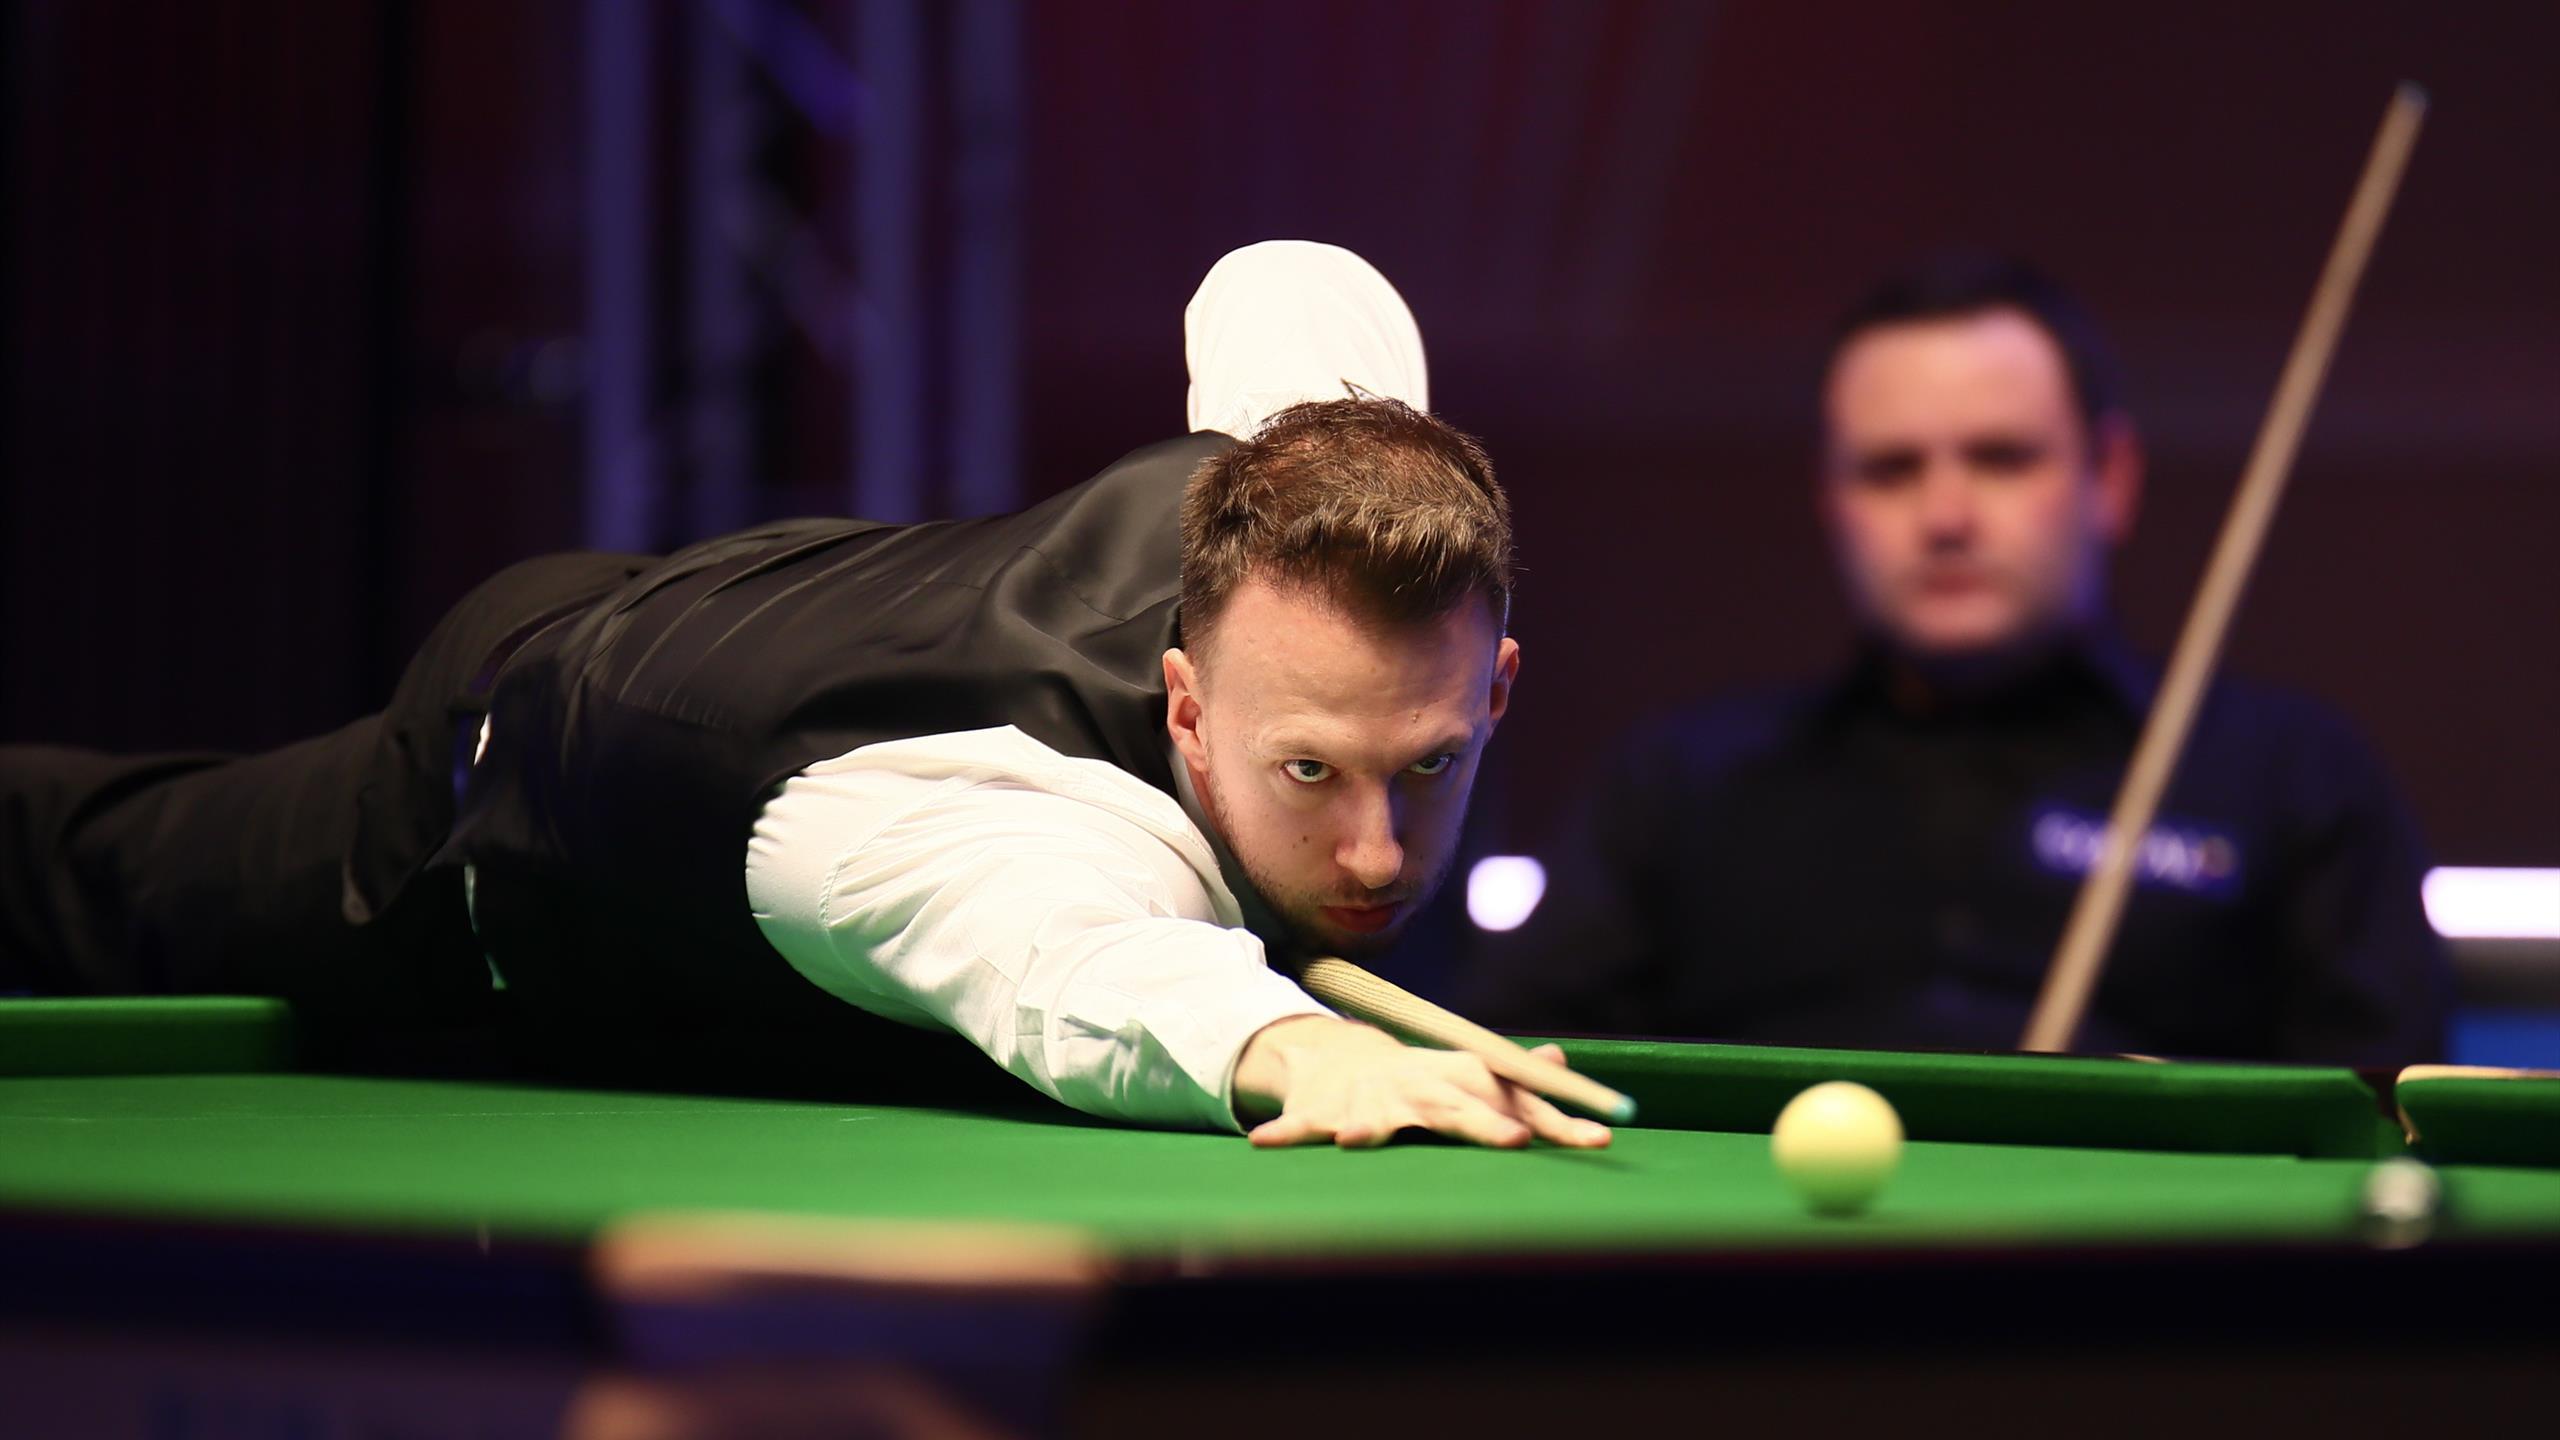 Snooker Weltrangliste 2021